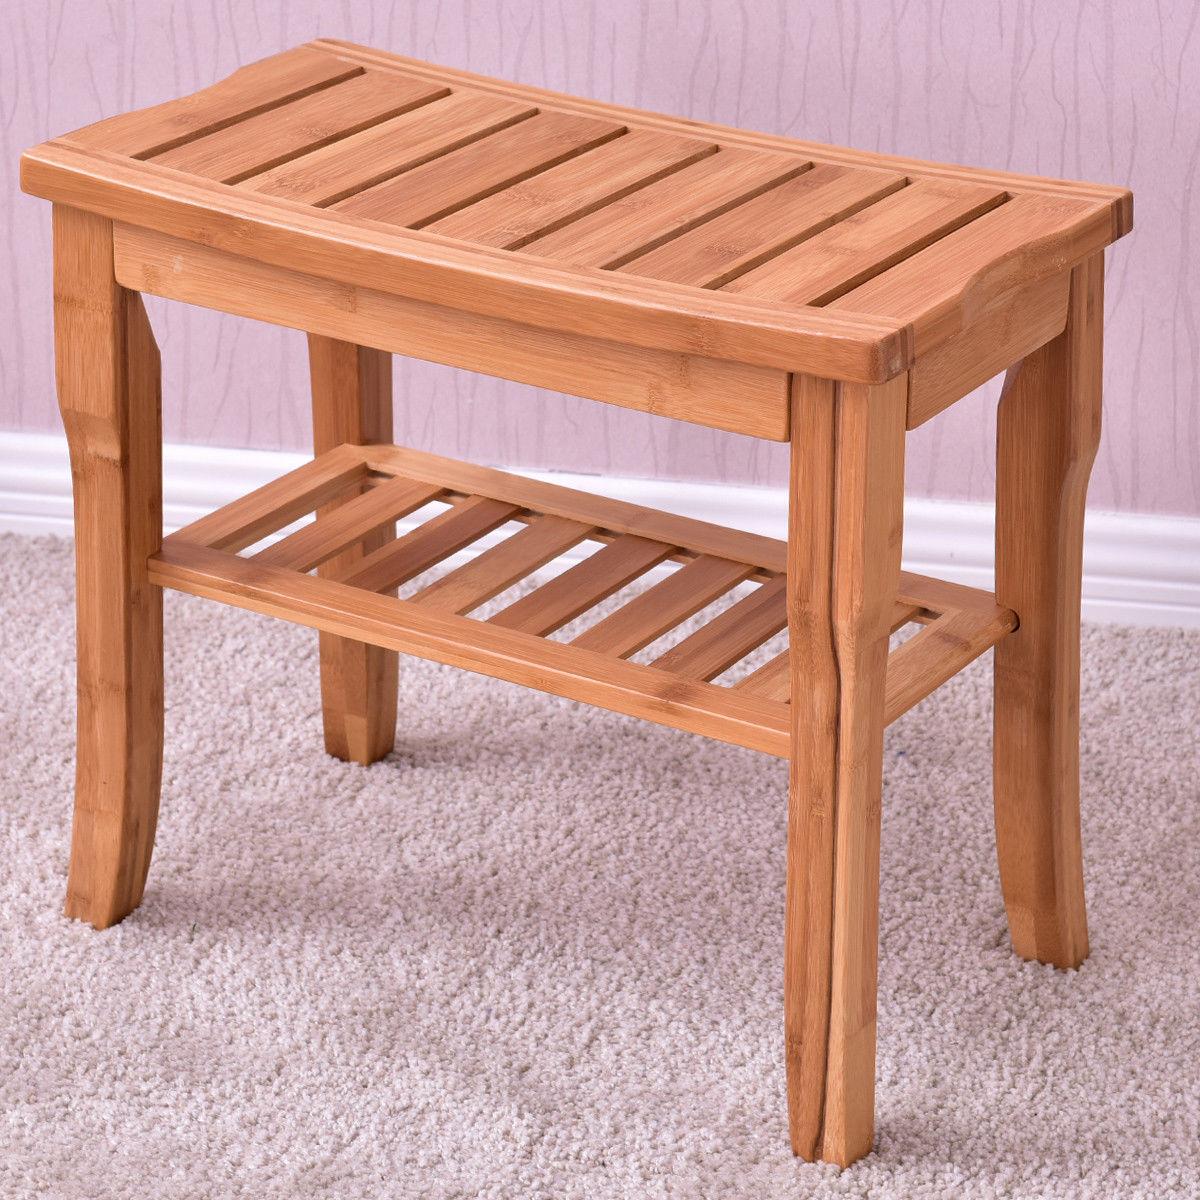 Giantex Bamboo Shower Chair Seat Bench Modern Wood Bathroom Spa Bath ...